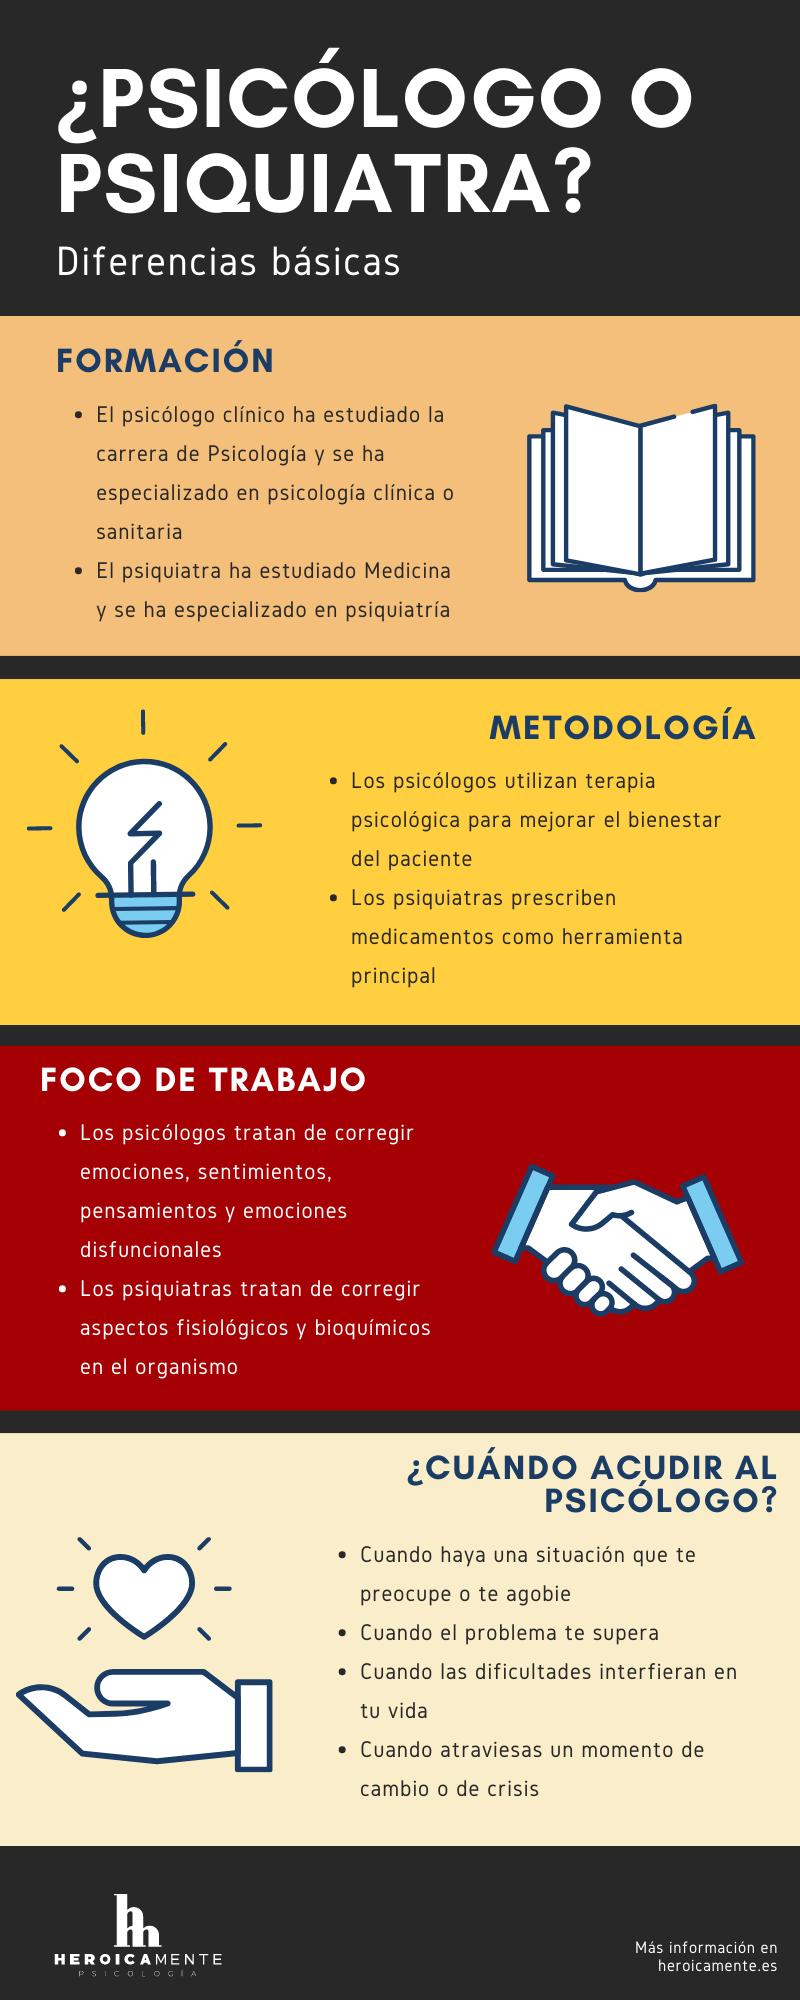 Infografía - psiquiatra vs psicólogo diferencias